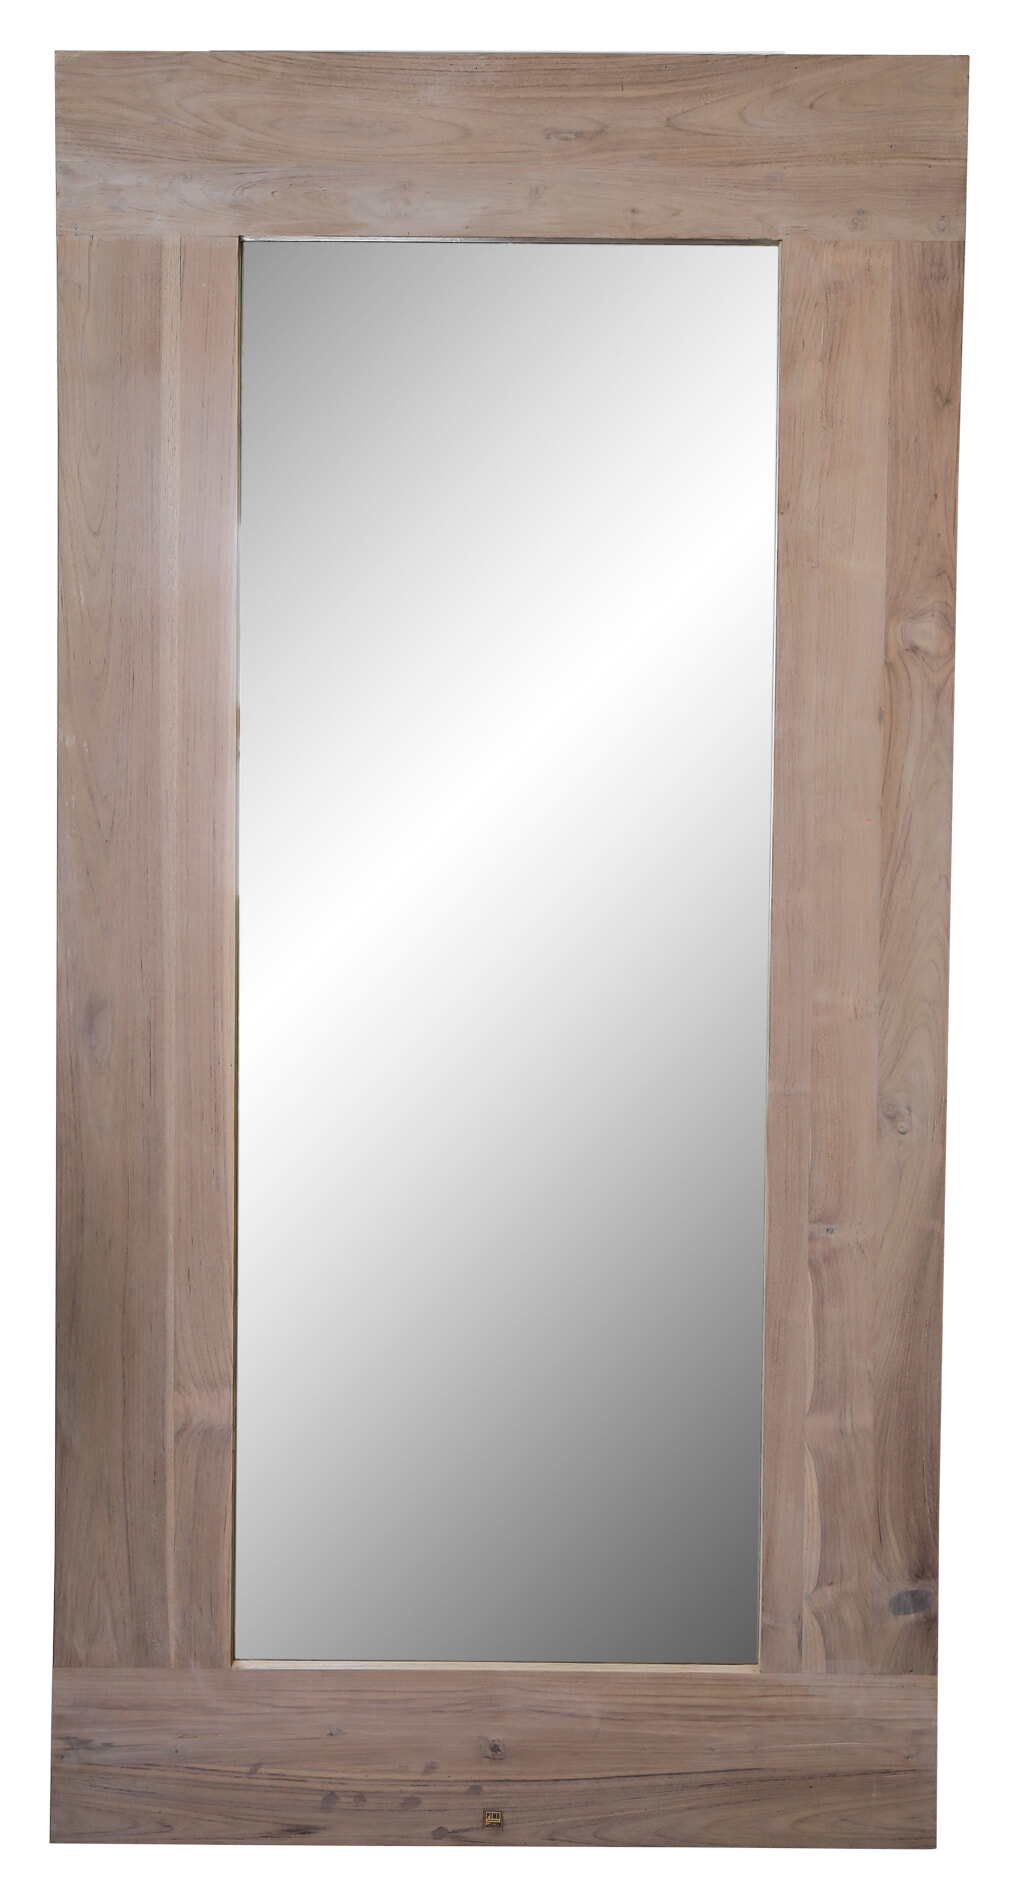 PTMD Spiegel 'Ryan' 200 x 100cm